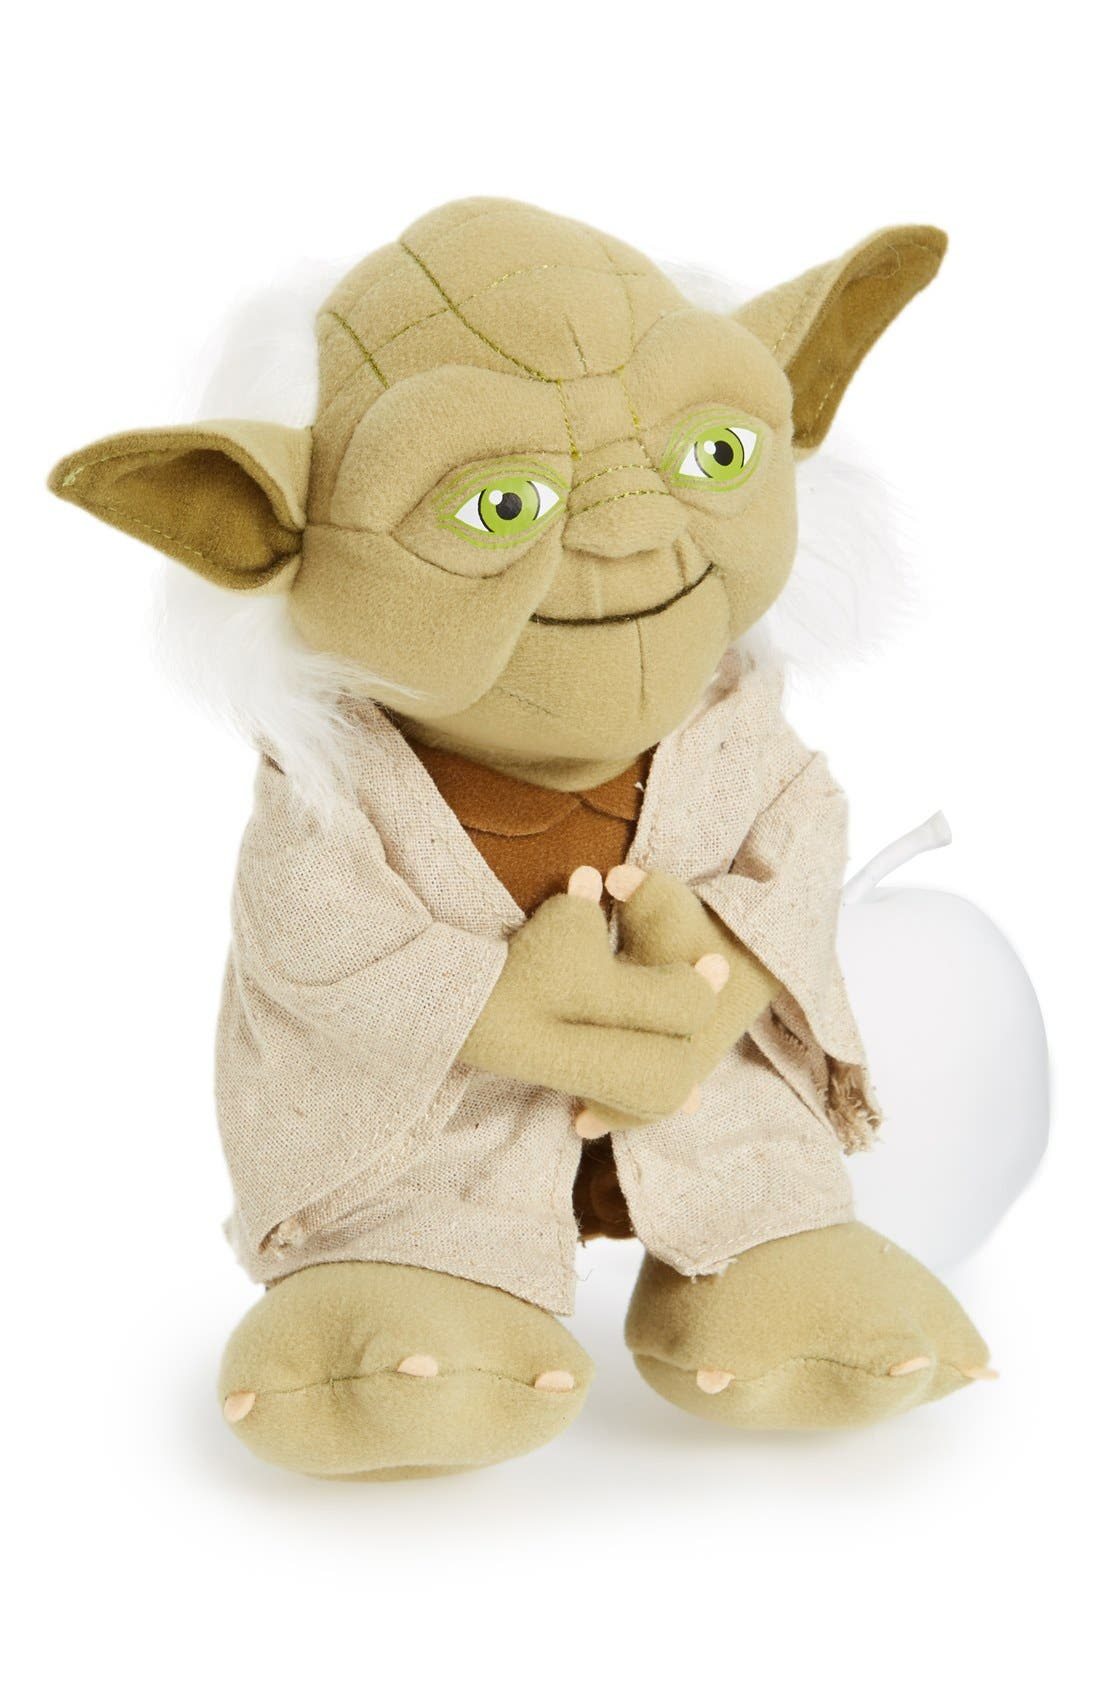 UNDERGROUND TOYS,                             'Talking Yoda' Plush Toy,                             Main thumbnail 1, color,                             000